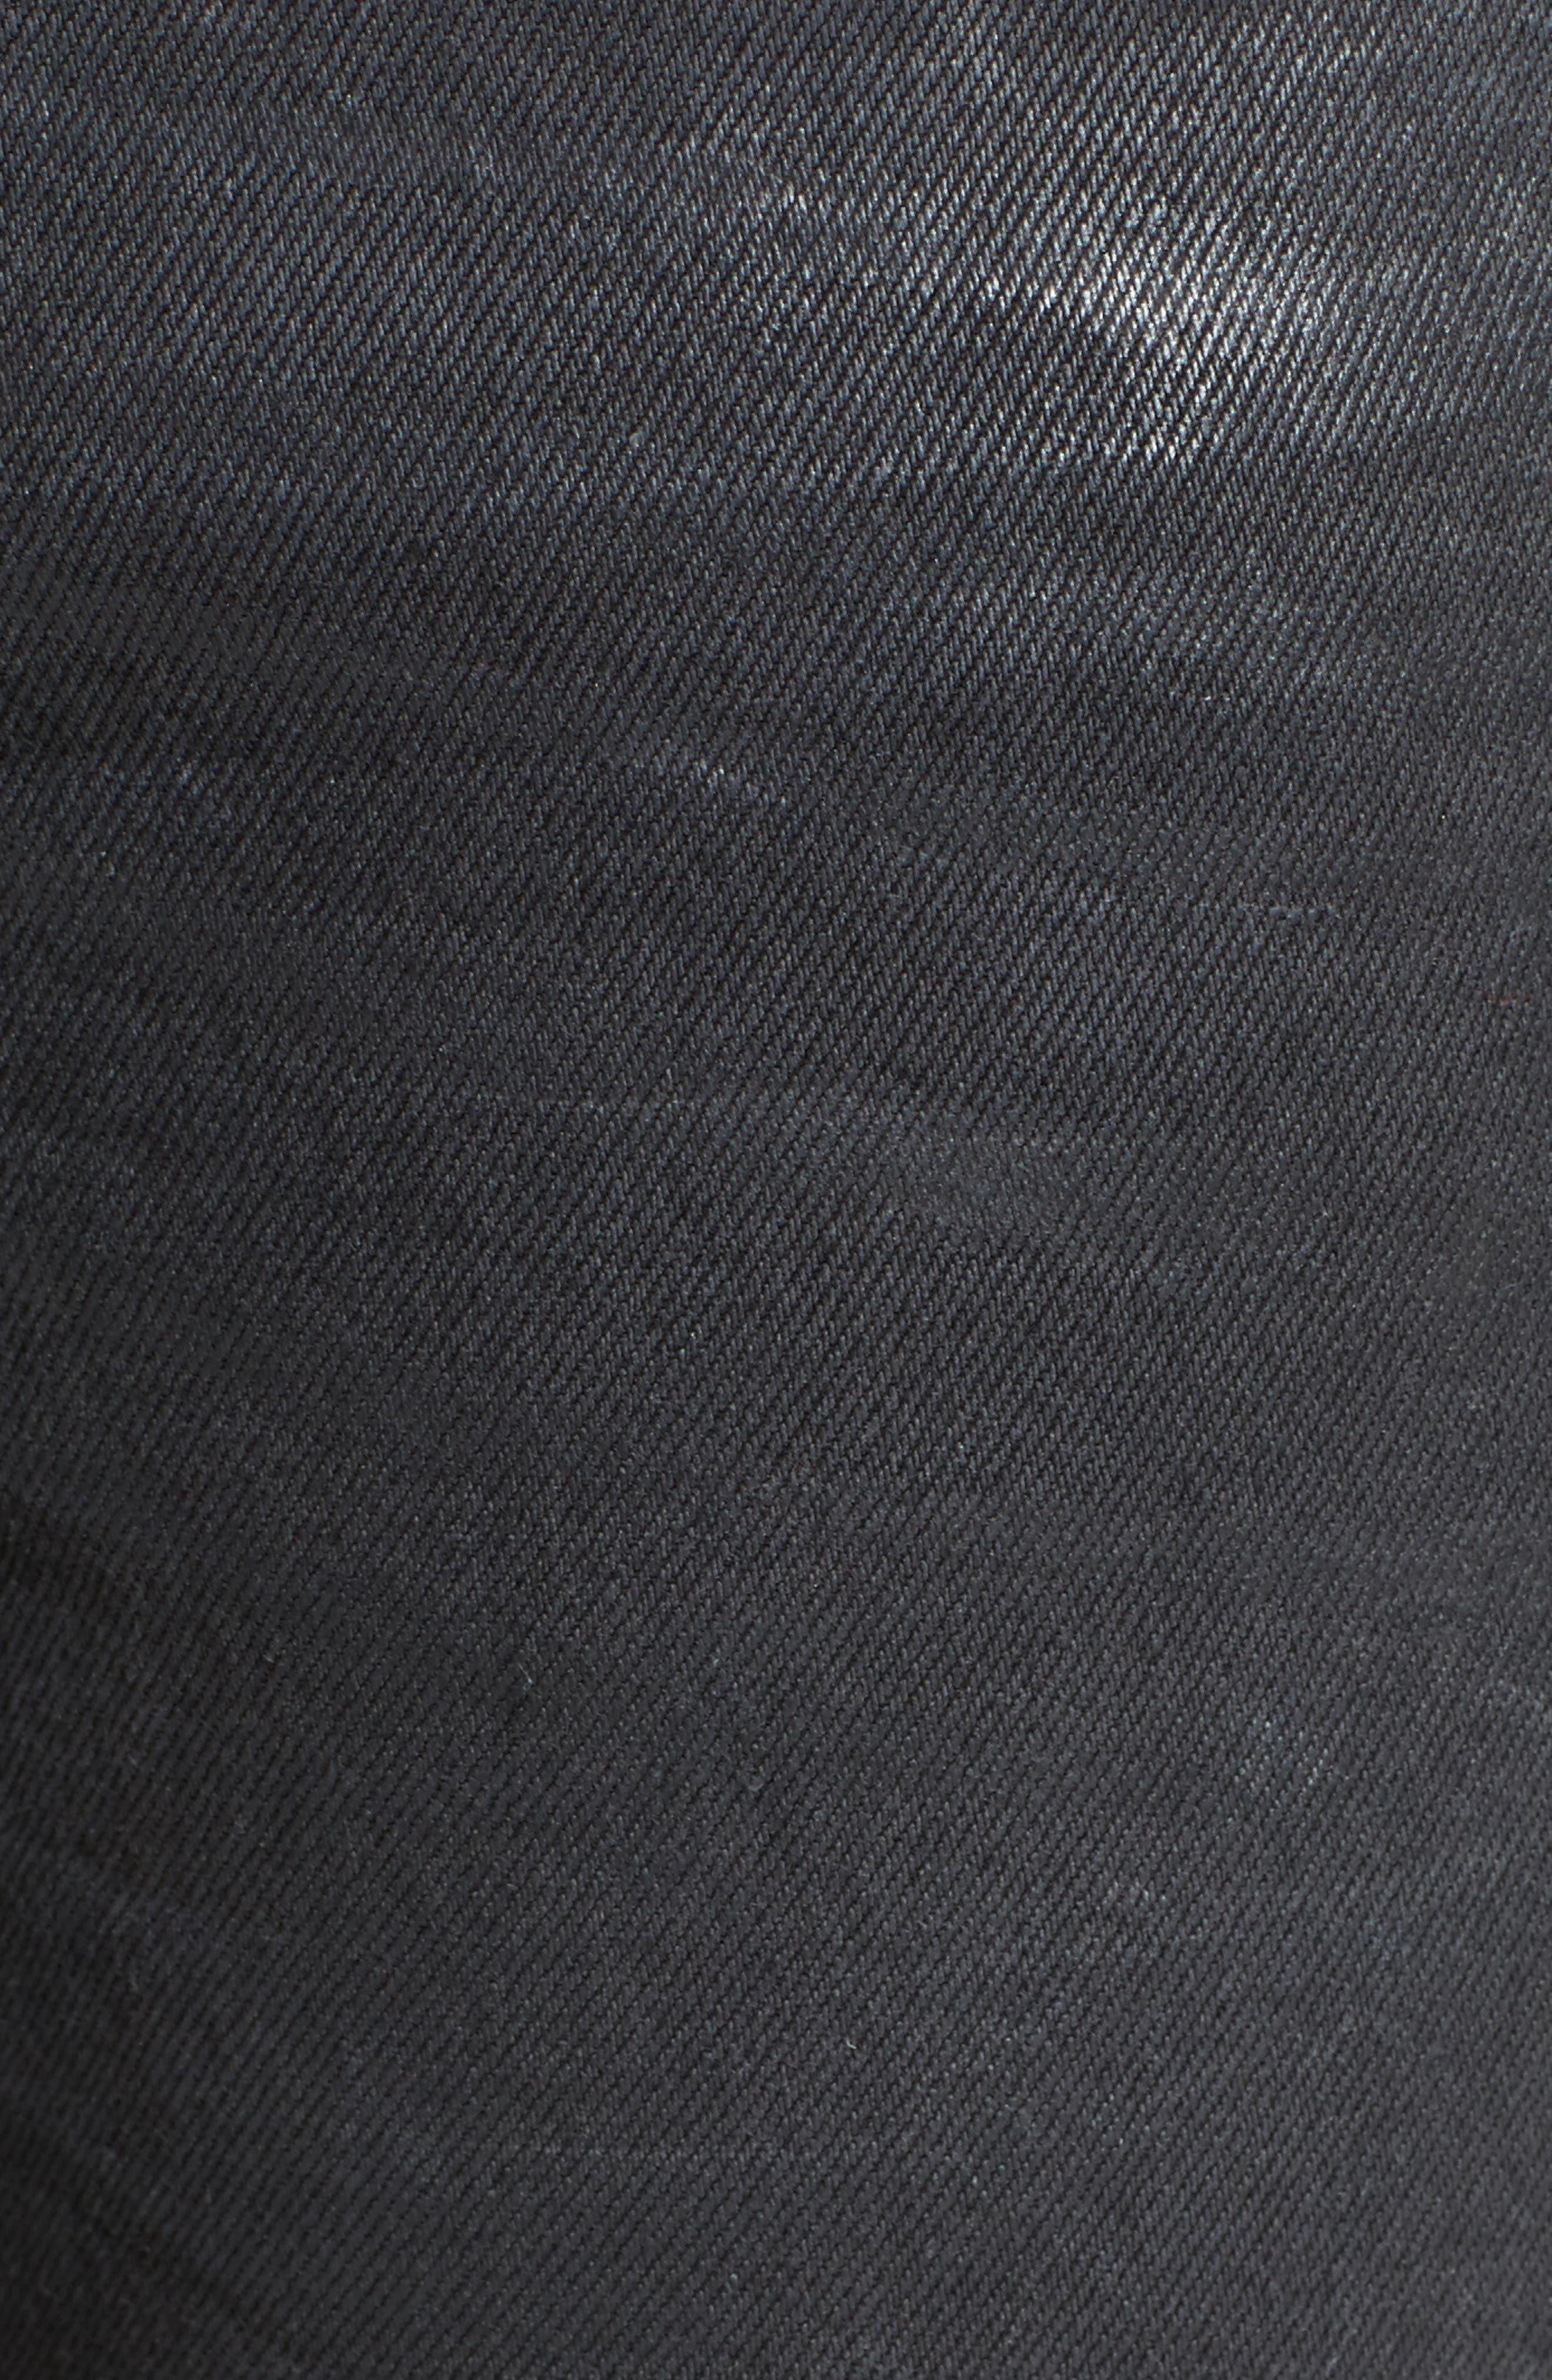 MR 87 Jeans,                             Alternate thumbnail 5, color,                             006